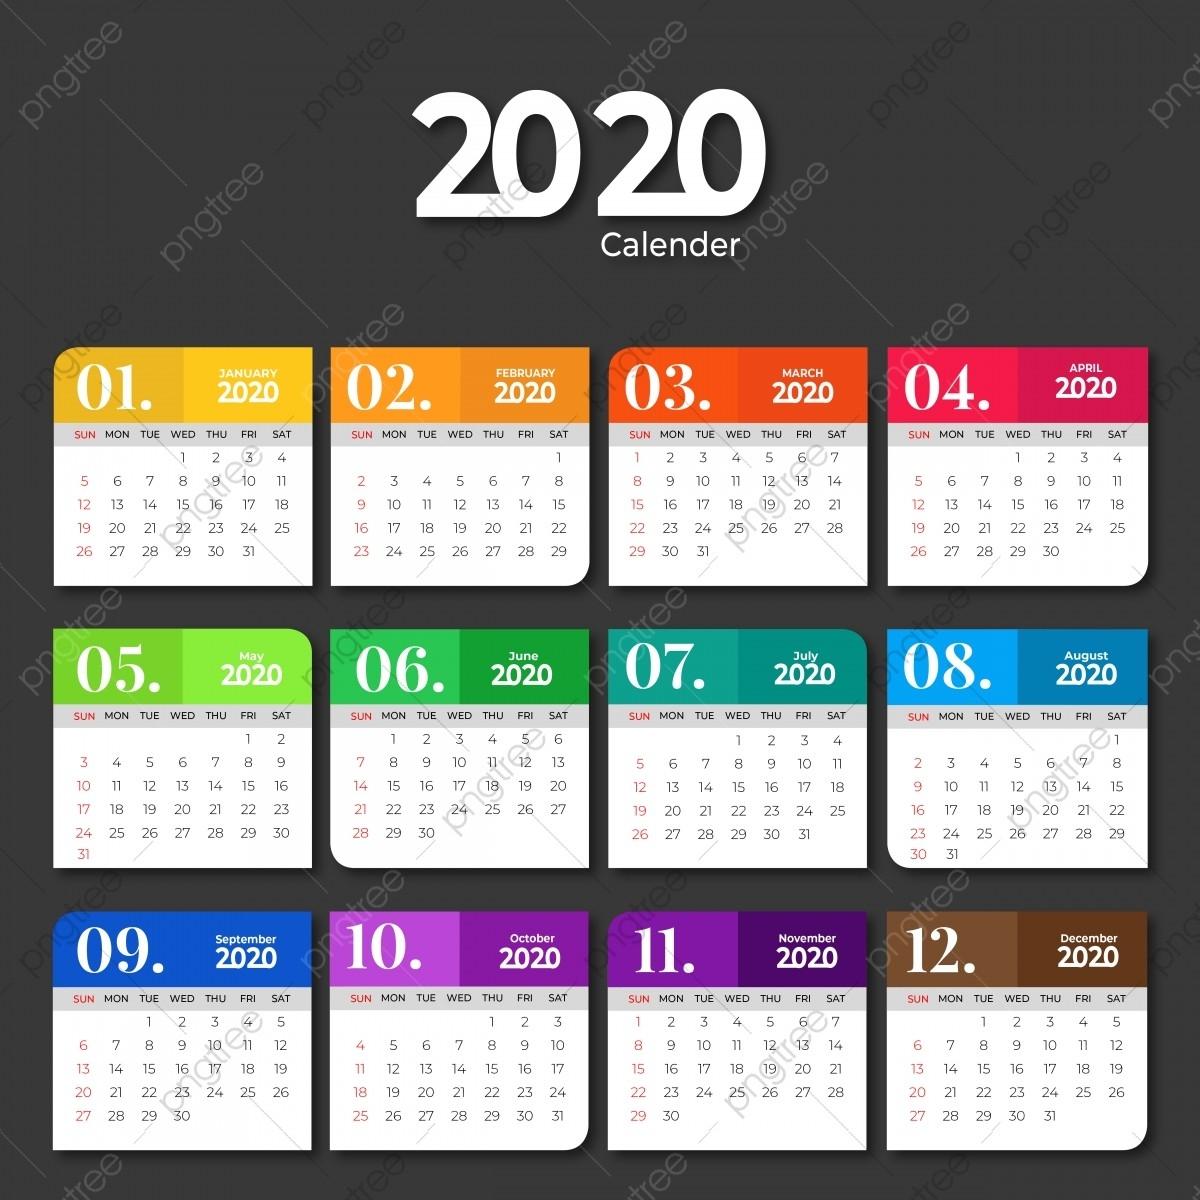 2020 Calendar Template Design With Solid Colors, 2020-2020 Calendar Template For Illustrator